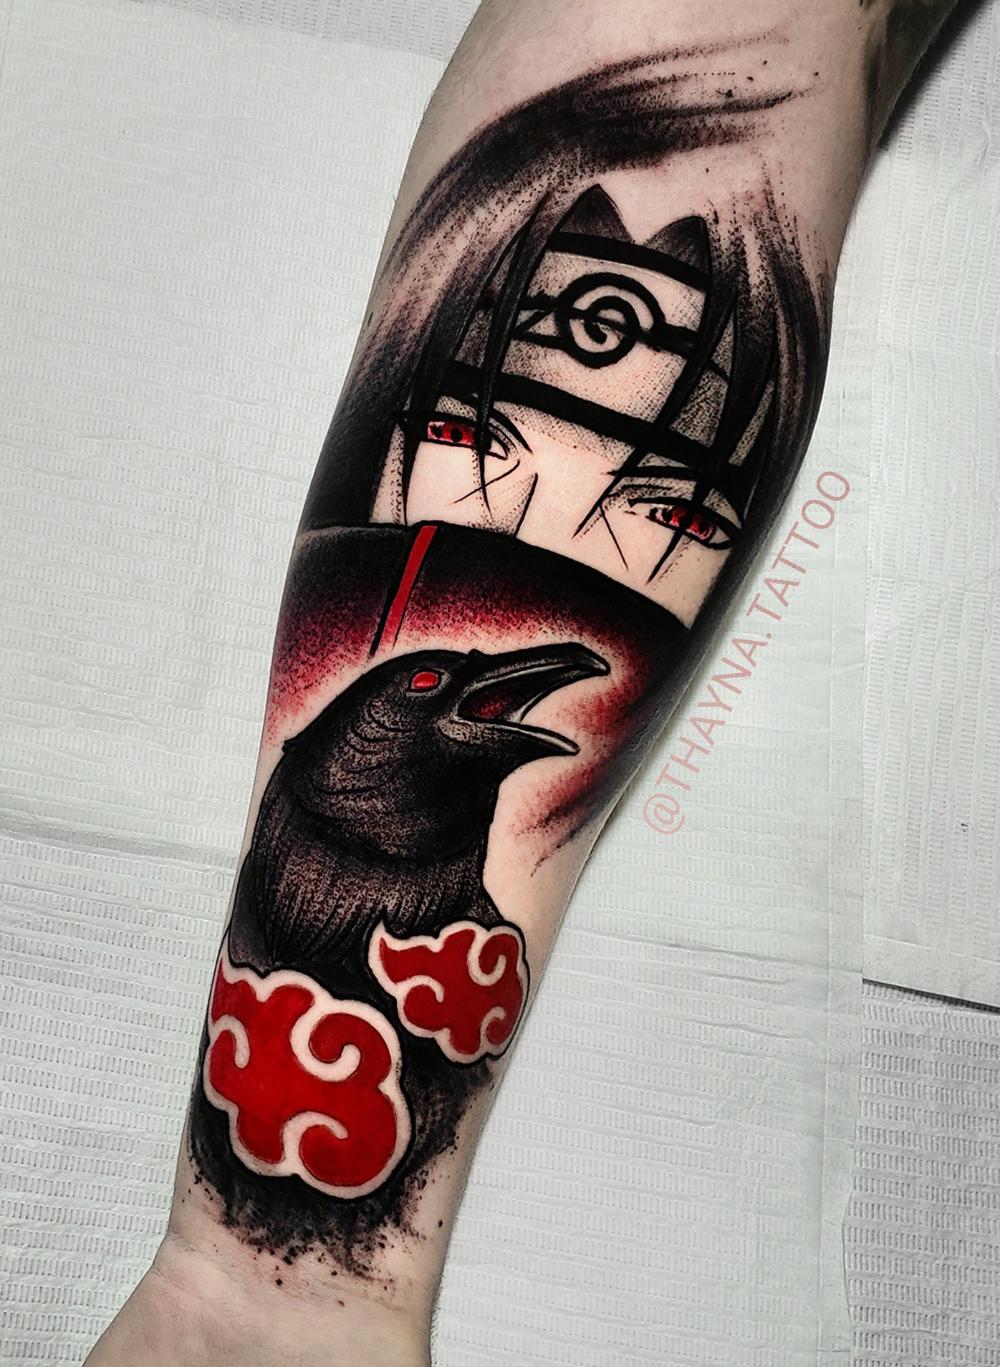 Comics, Geek, Nerd and Otaku The inspired tattoos on